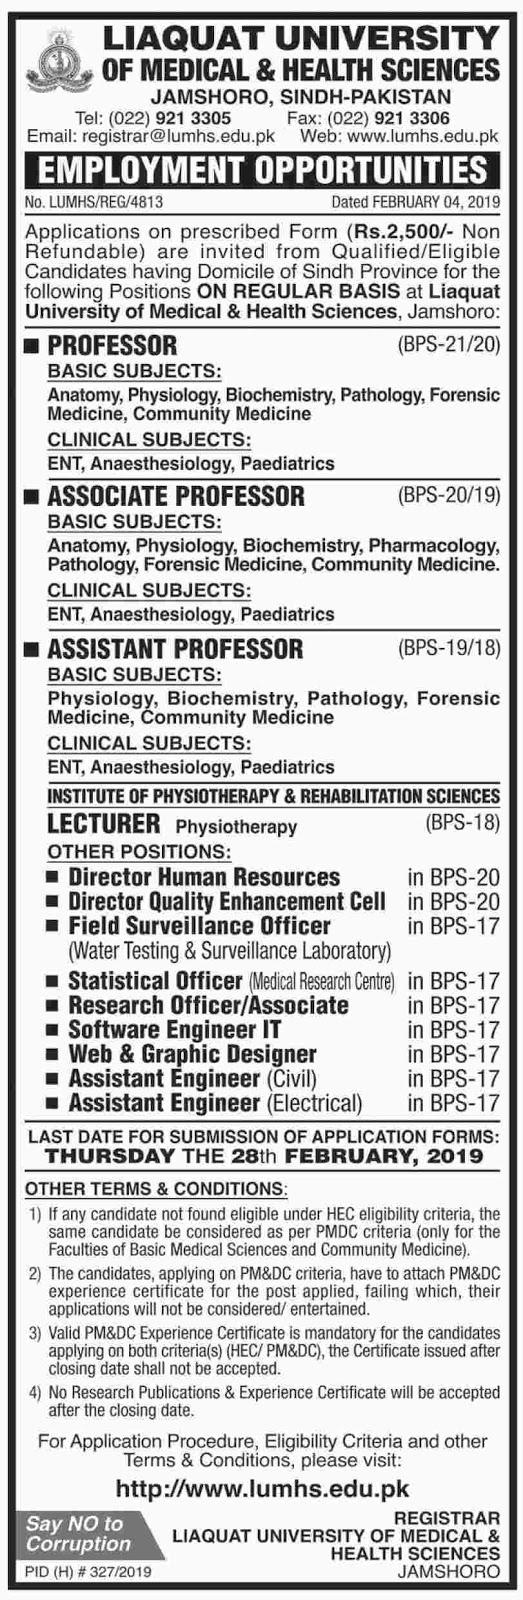 Jobs Vacancies In Liaquat University Of Medical And Health Sciences 06 February 2019